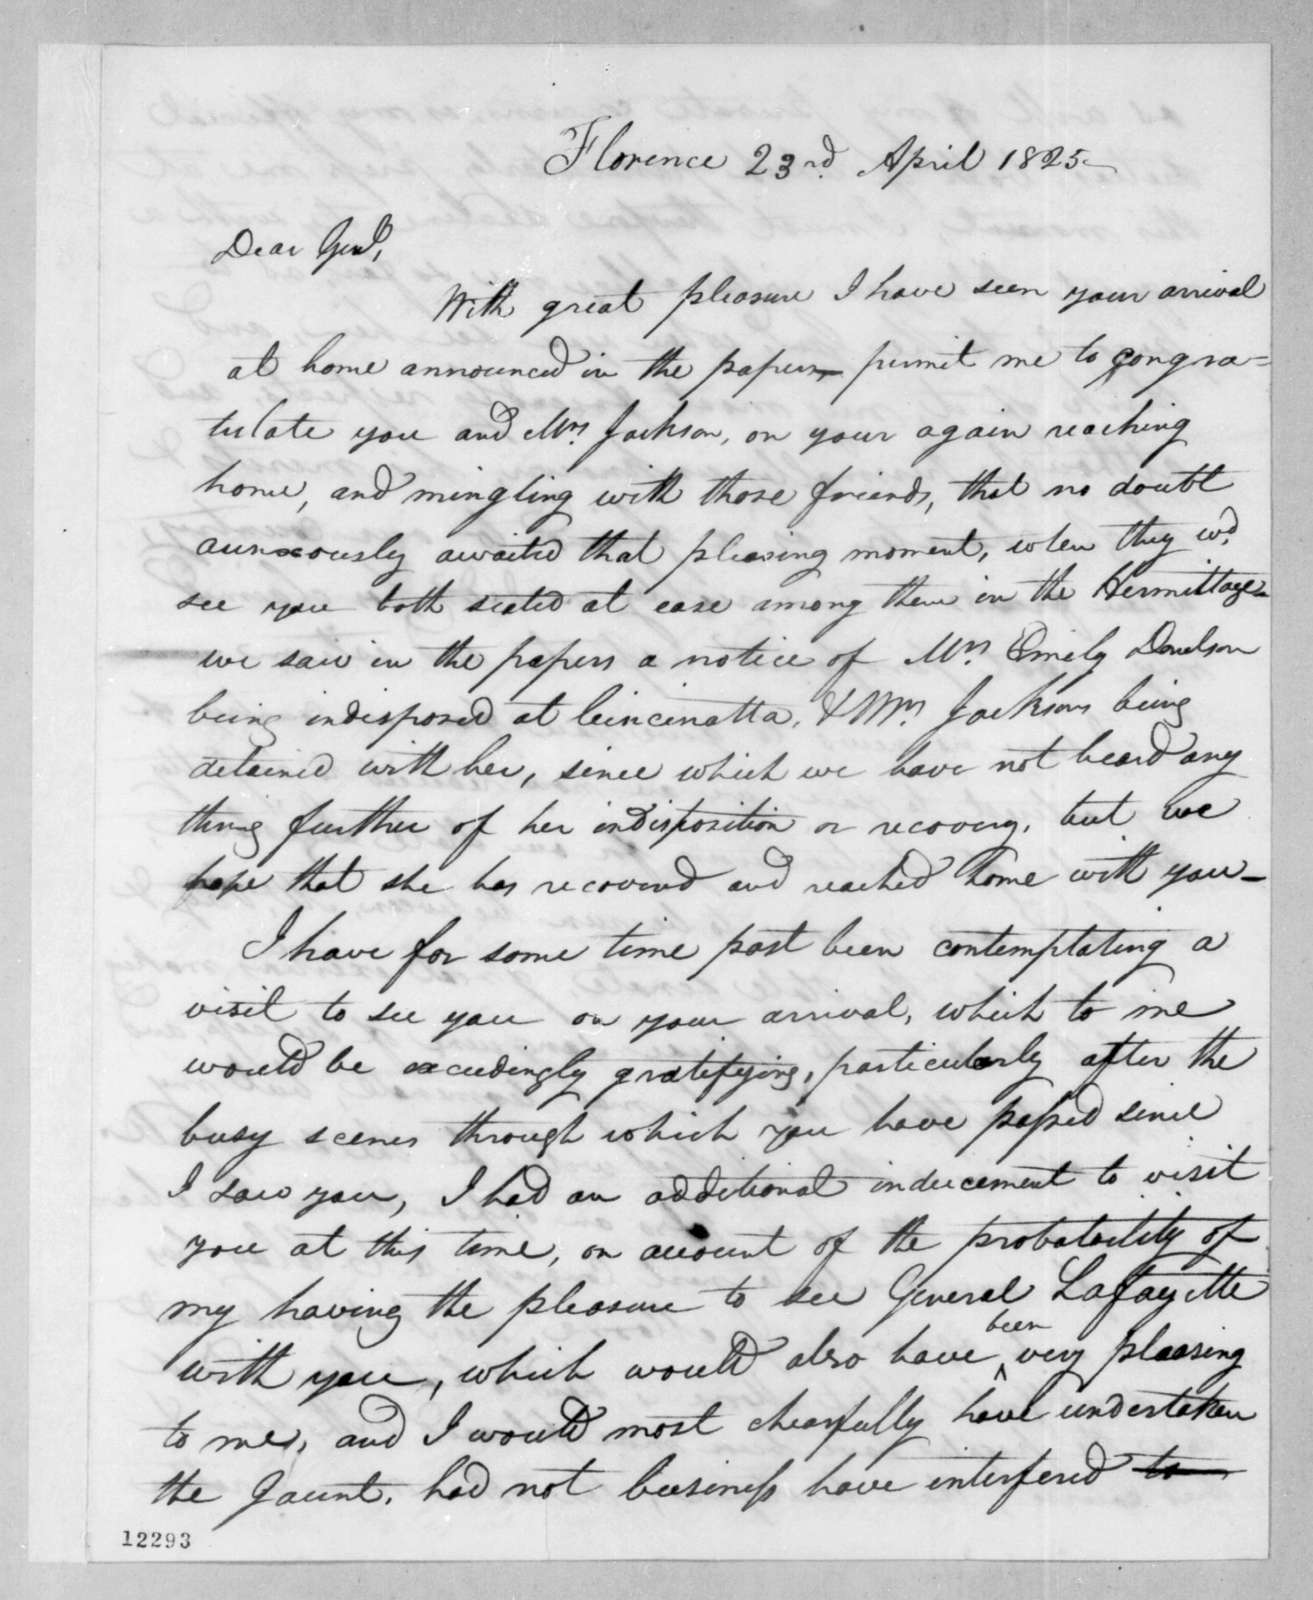 John Coffee to Andrew Jackson, April 23, 1825